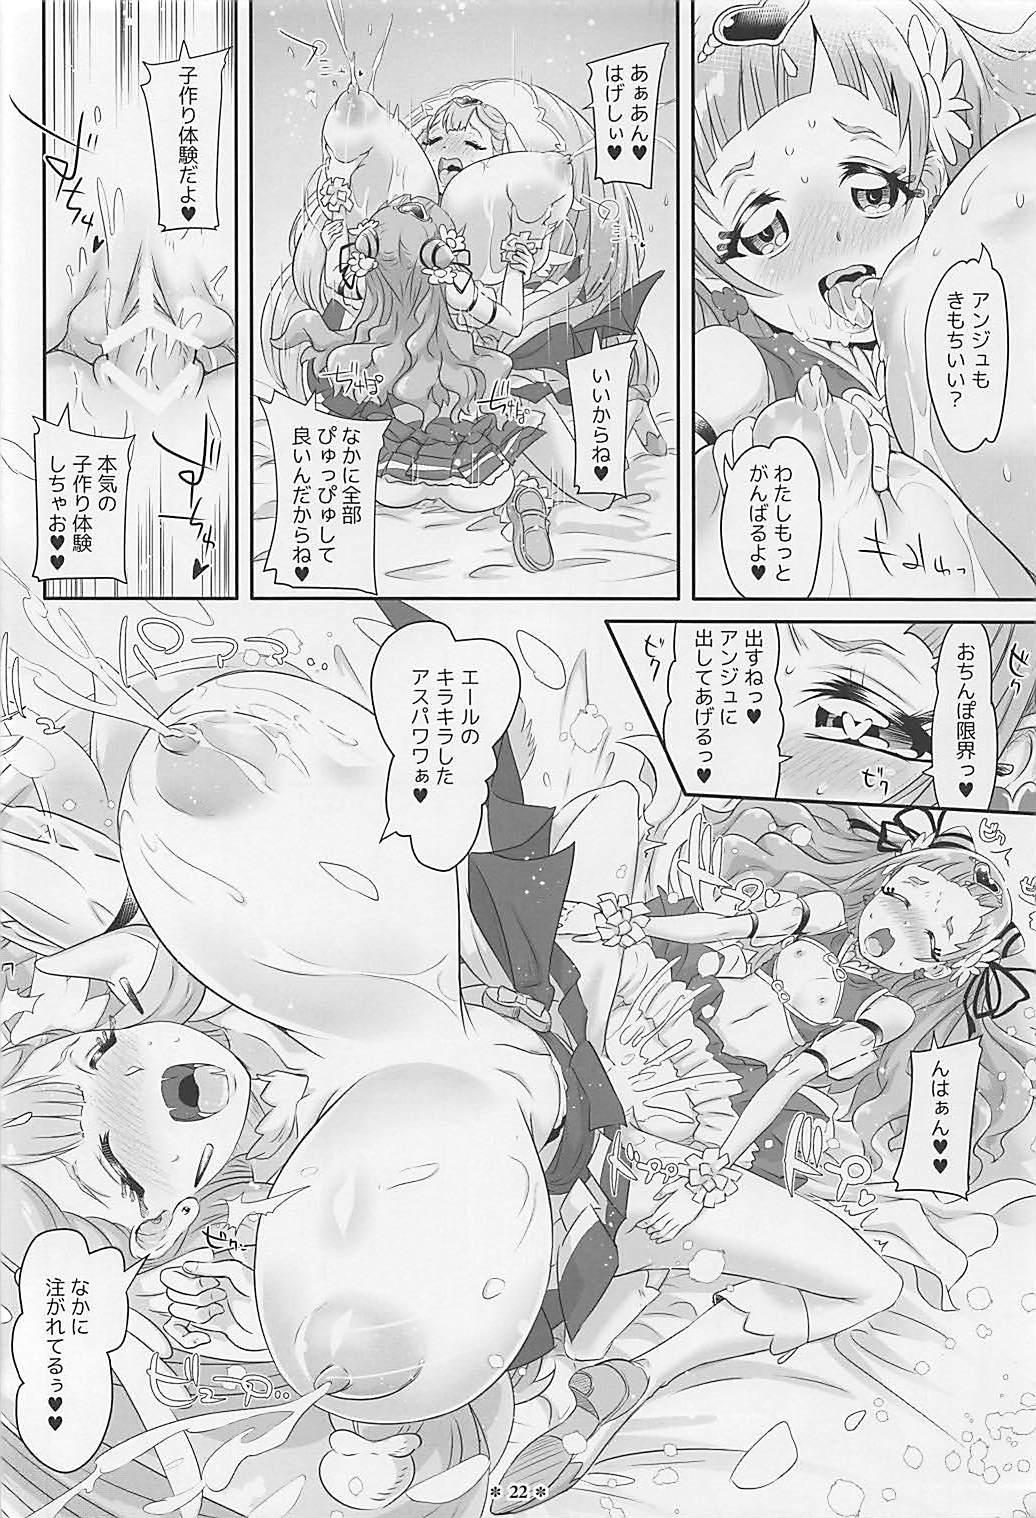 Hana to HUG Hagukumu Saaya no Oppai 20